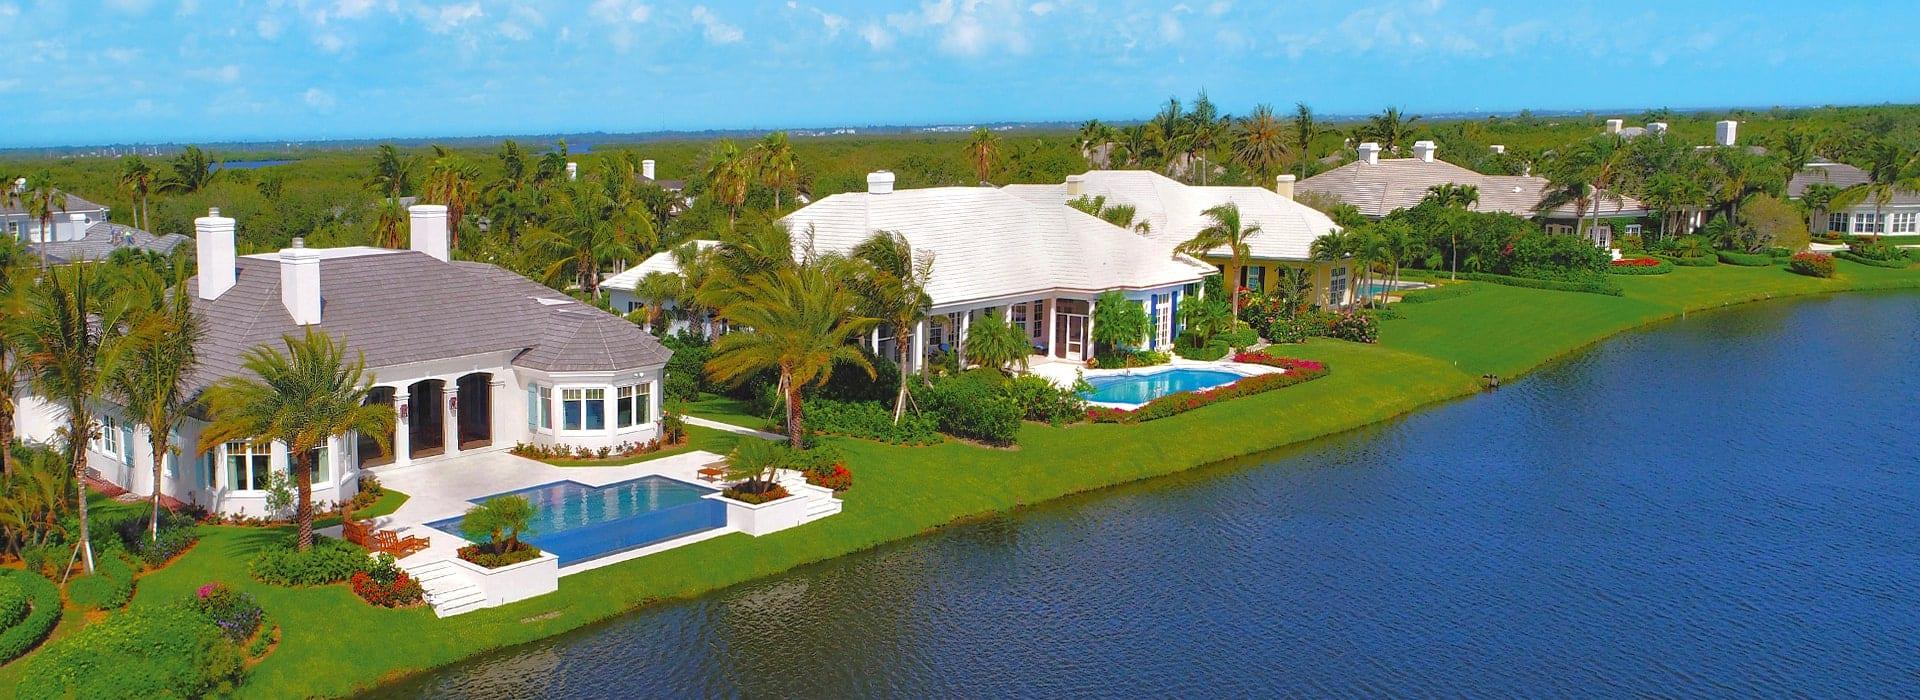 Vero Beach Single Family Homes